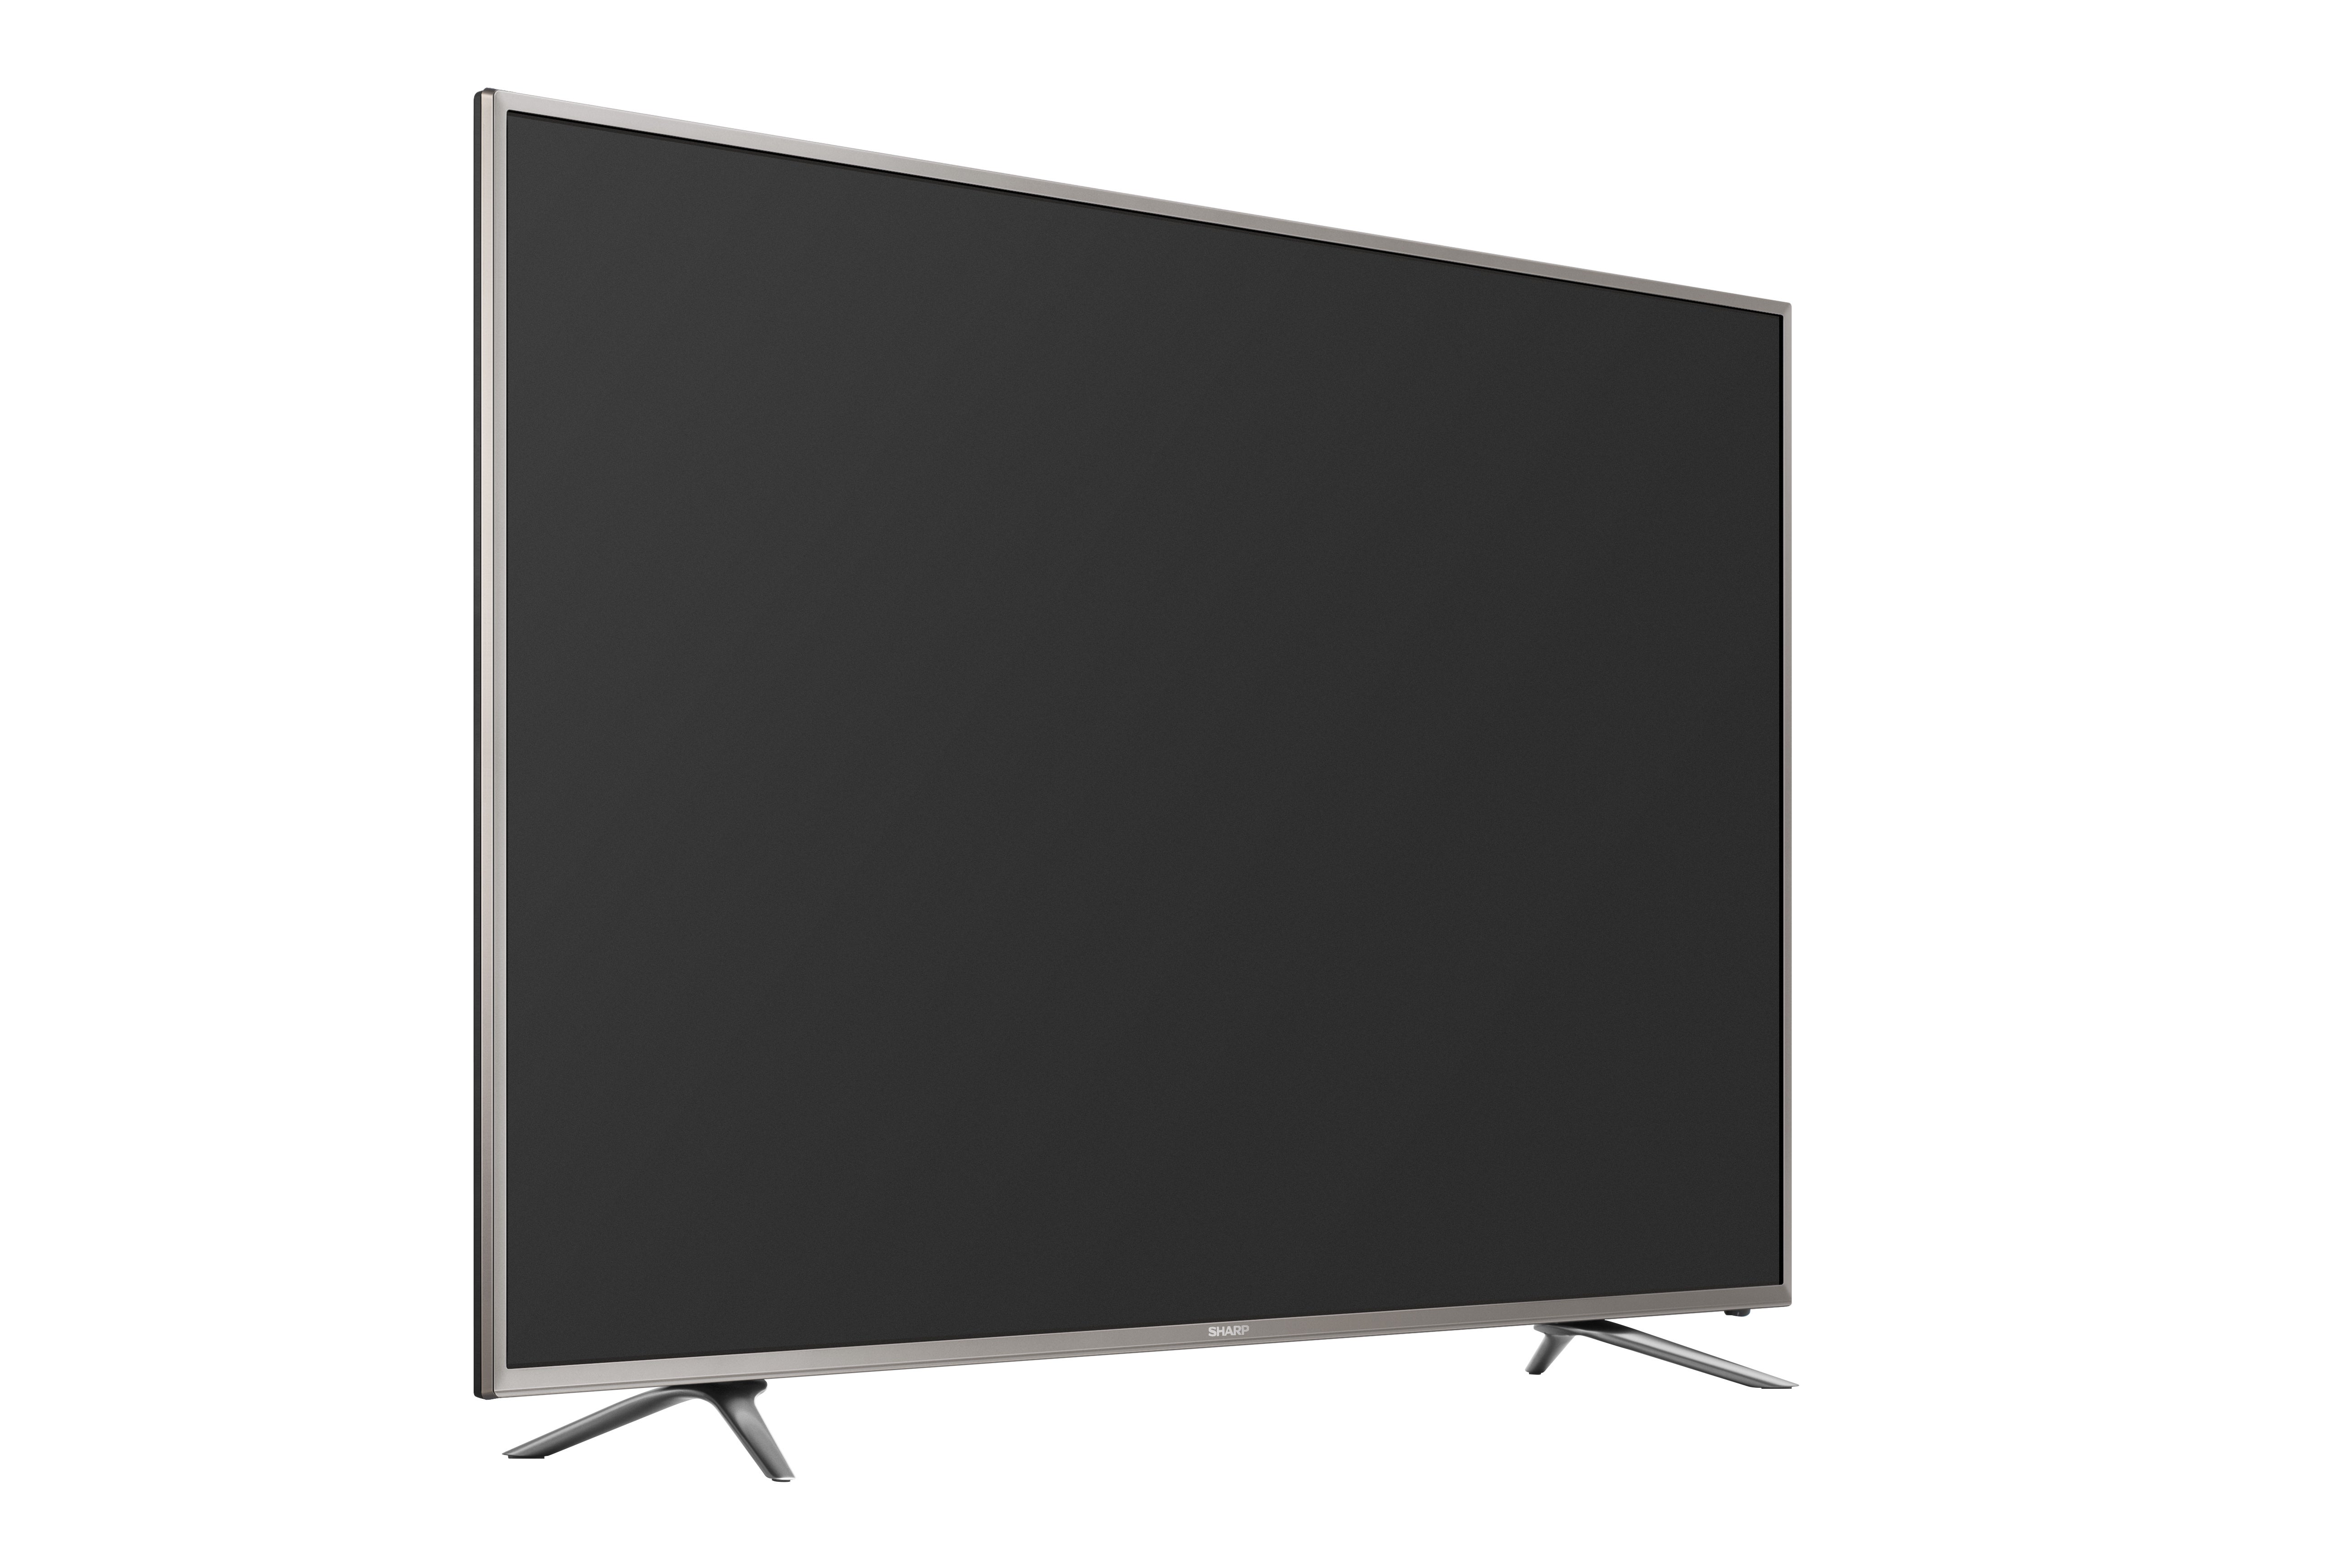 sharp 65 inch 4k tv. hu60k550uwg45to the right sharp 65 inch 4k tv